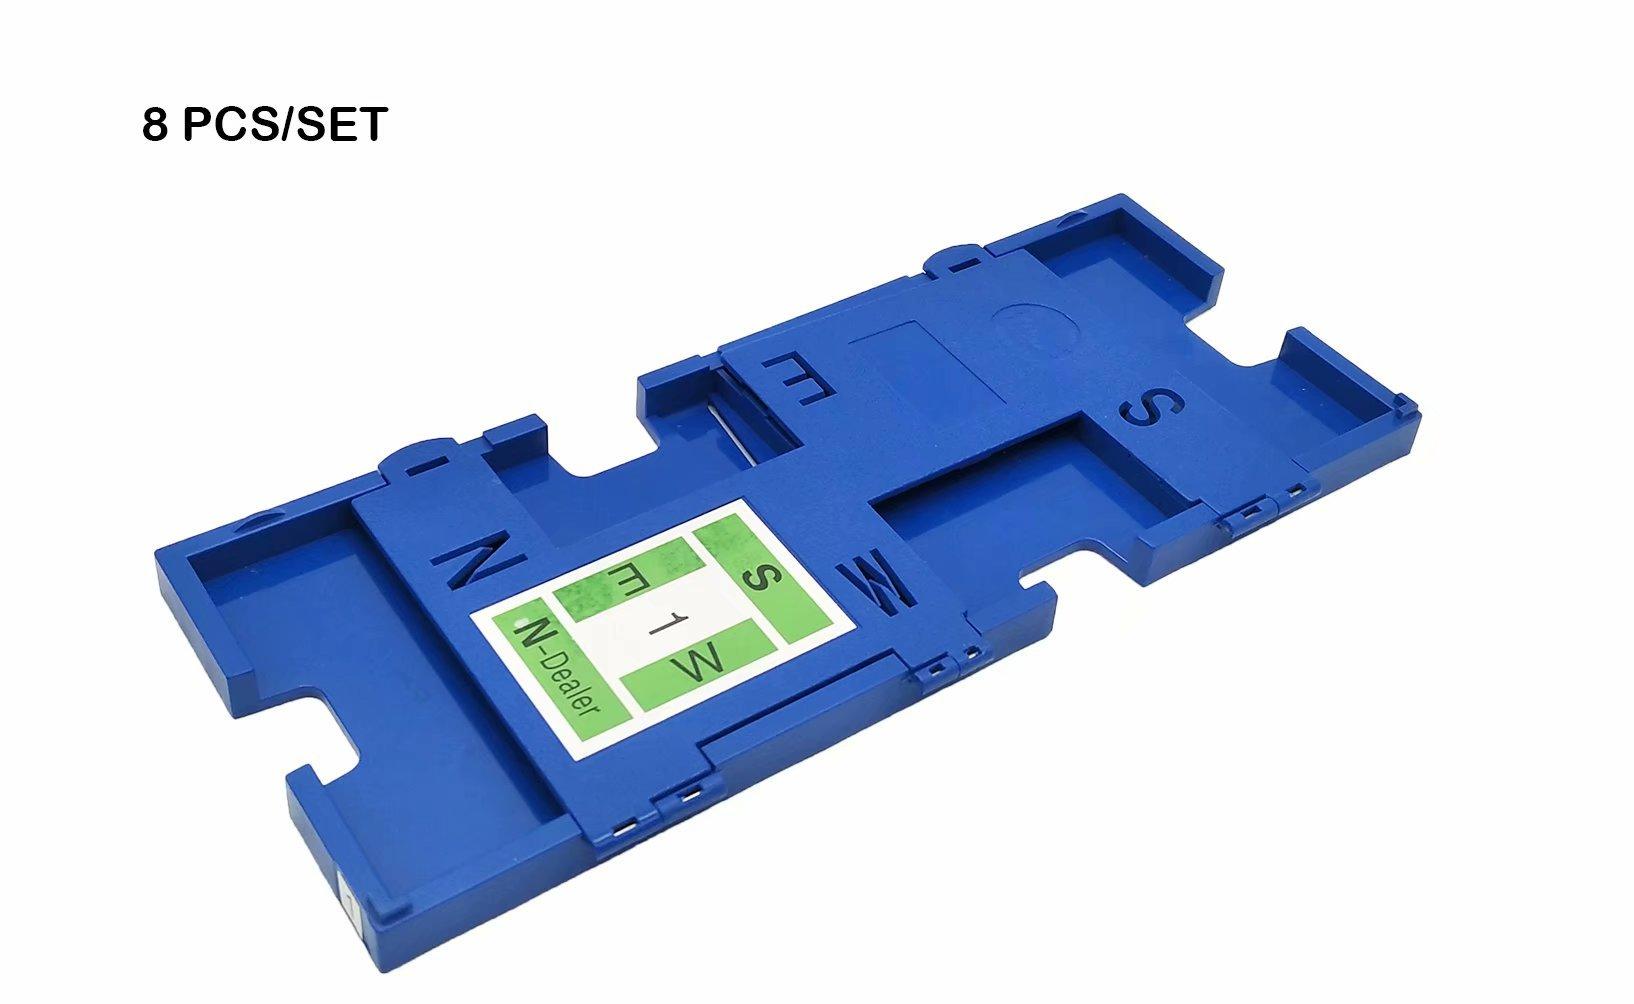 Duplicate Boards Bridge Kit for Bridge Cards Game of 8 PCS/Lot navy blue